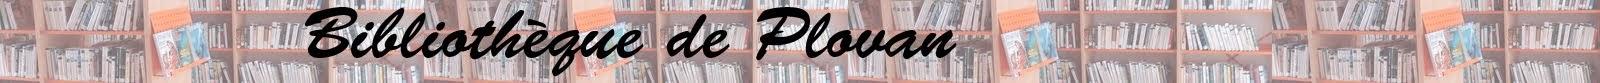 Bibliotheque de Plovan